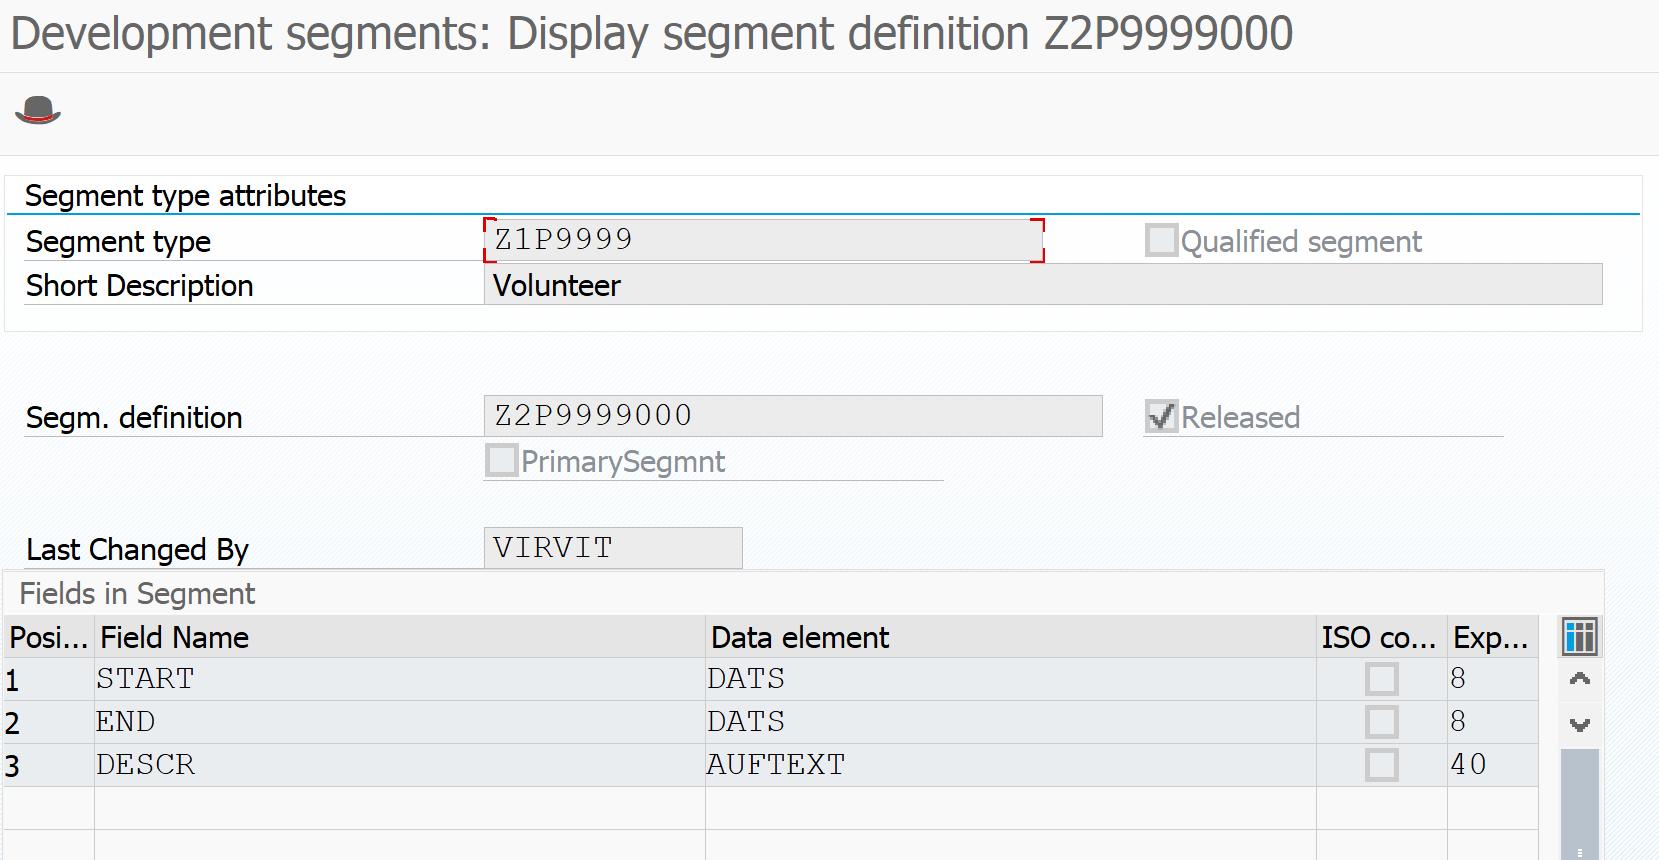 SAP IDOC segment definition